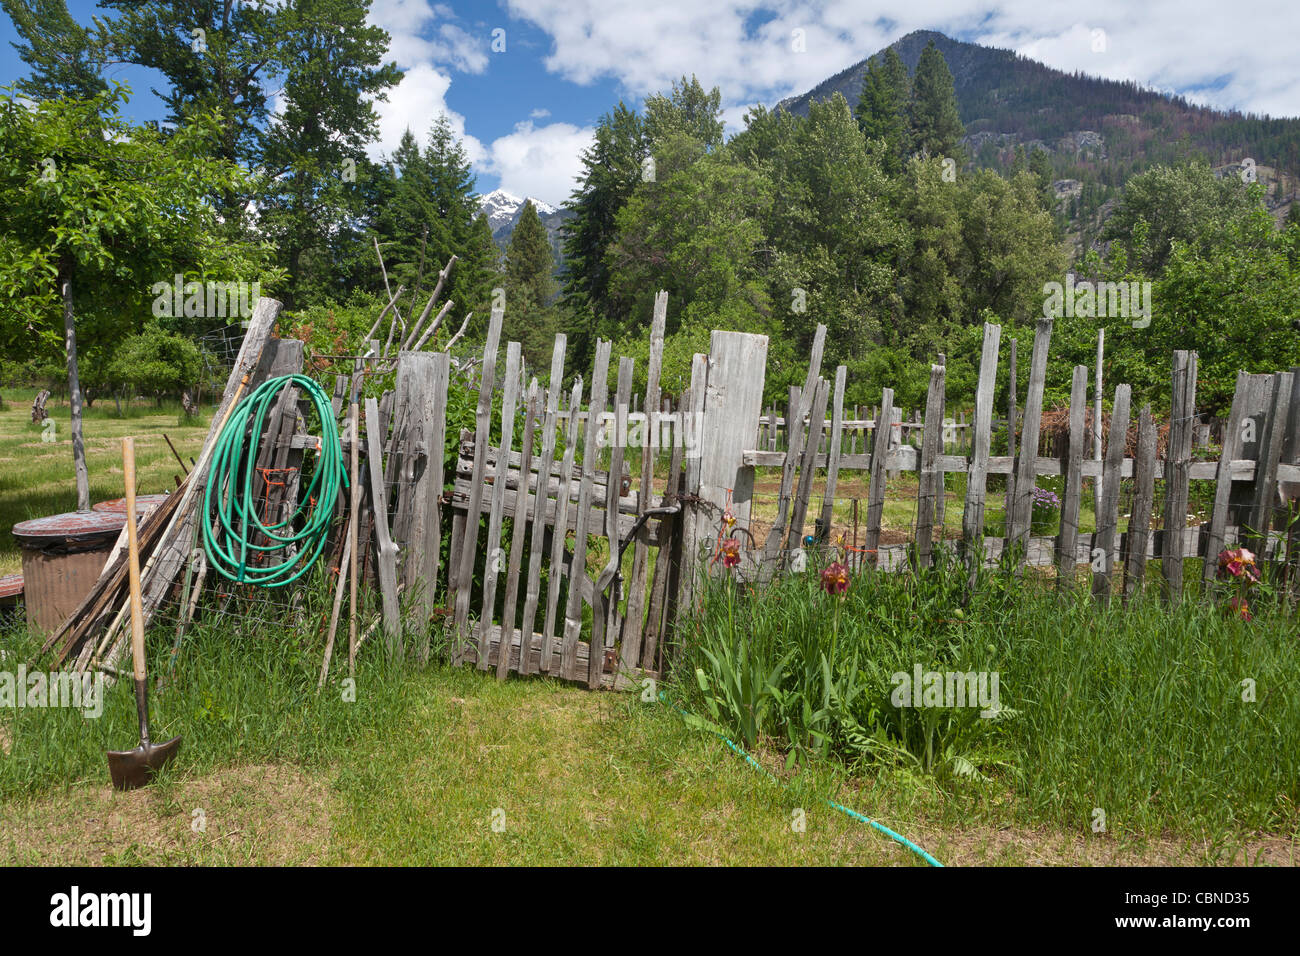 Organic Garden, Historic Buckner Orchard and Homestead North Cascades National Park, Washington - Stock Image